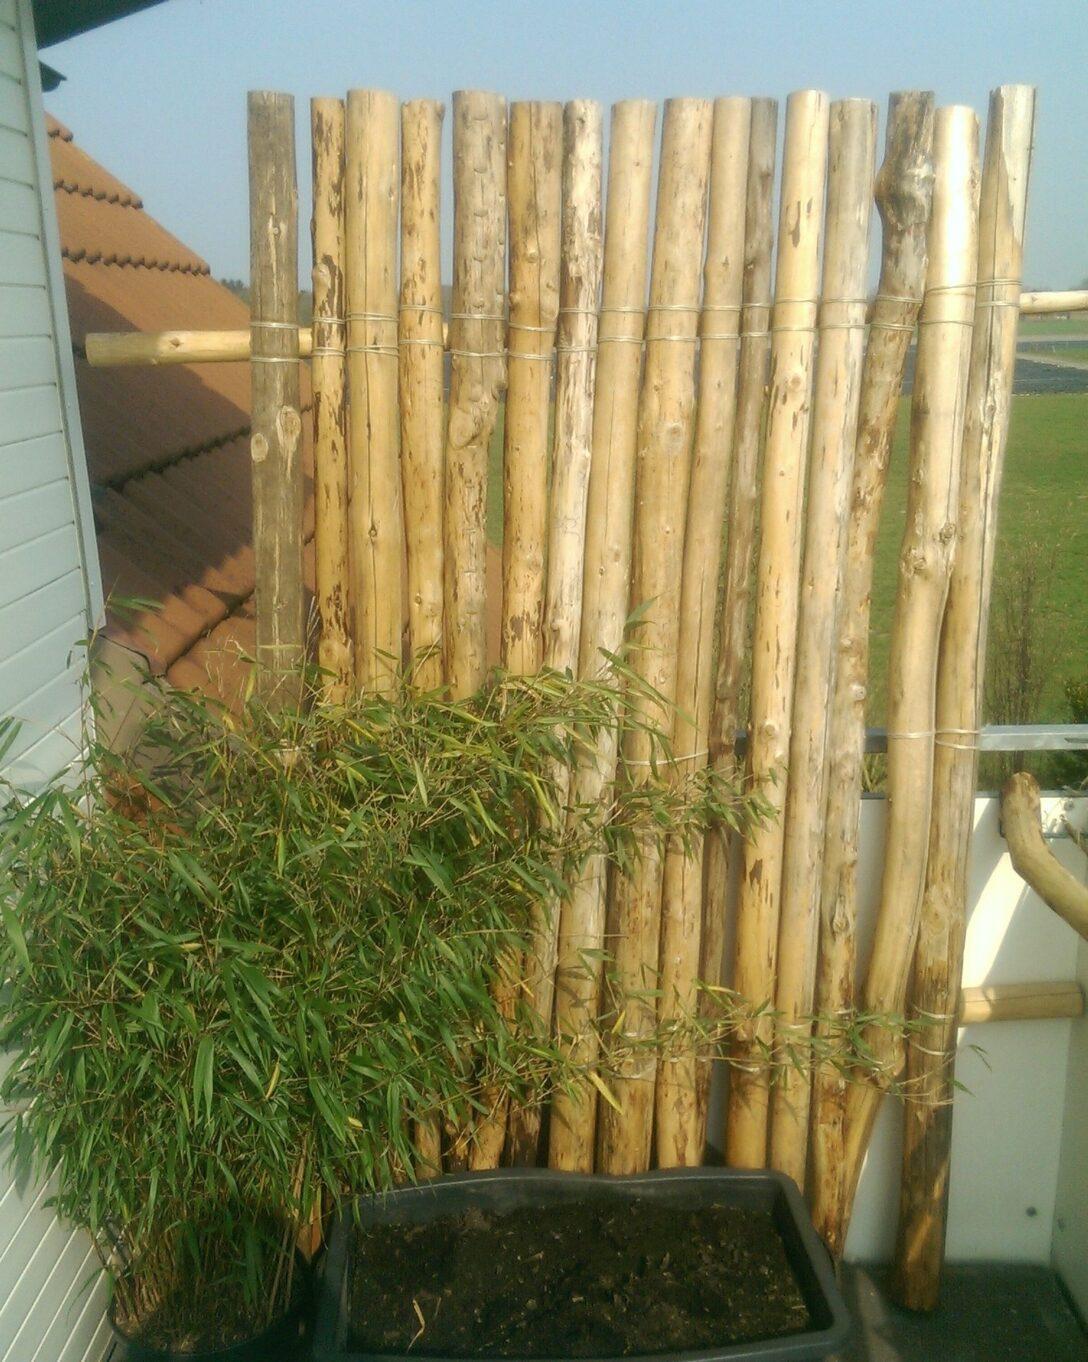 Large Size of Paravent Bambus Balkon Obi Selbstgemacht Kreativer Windschutz Garten Bett Wohnzimmer Paravent Bambus Balkon